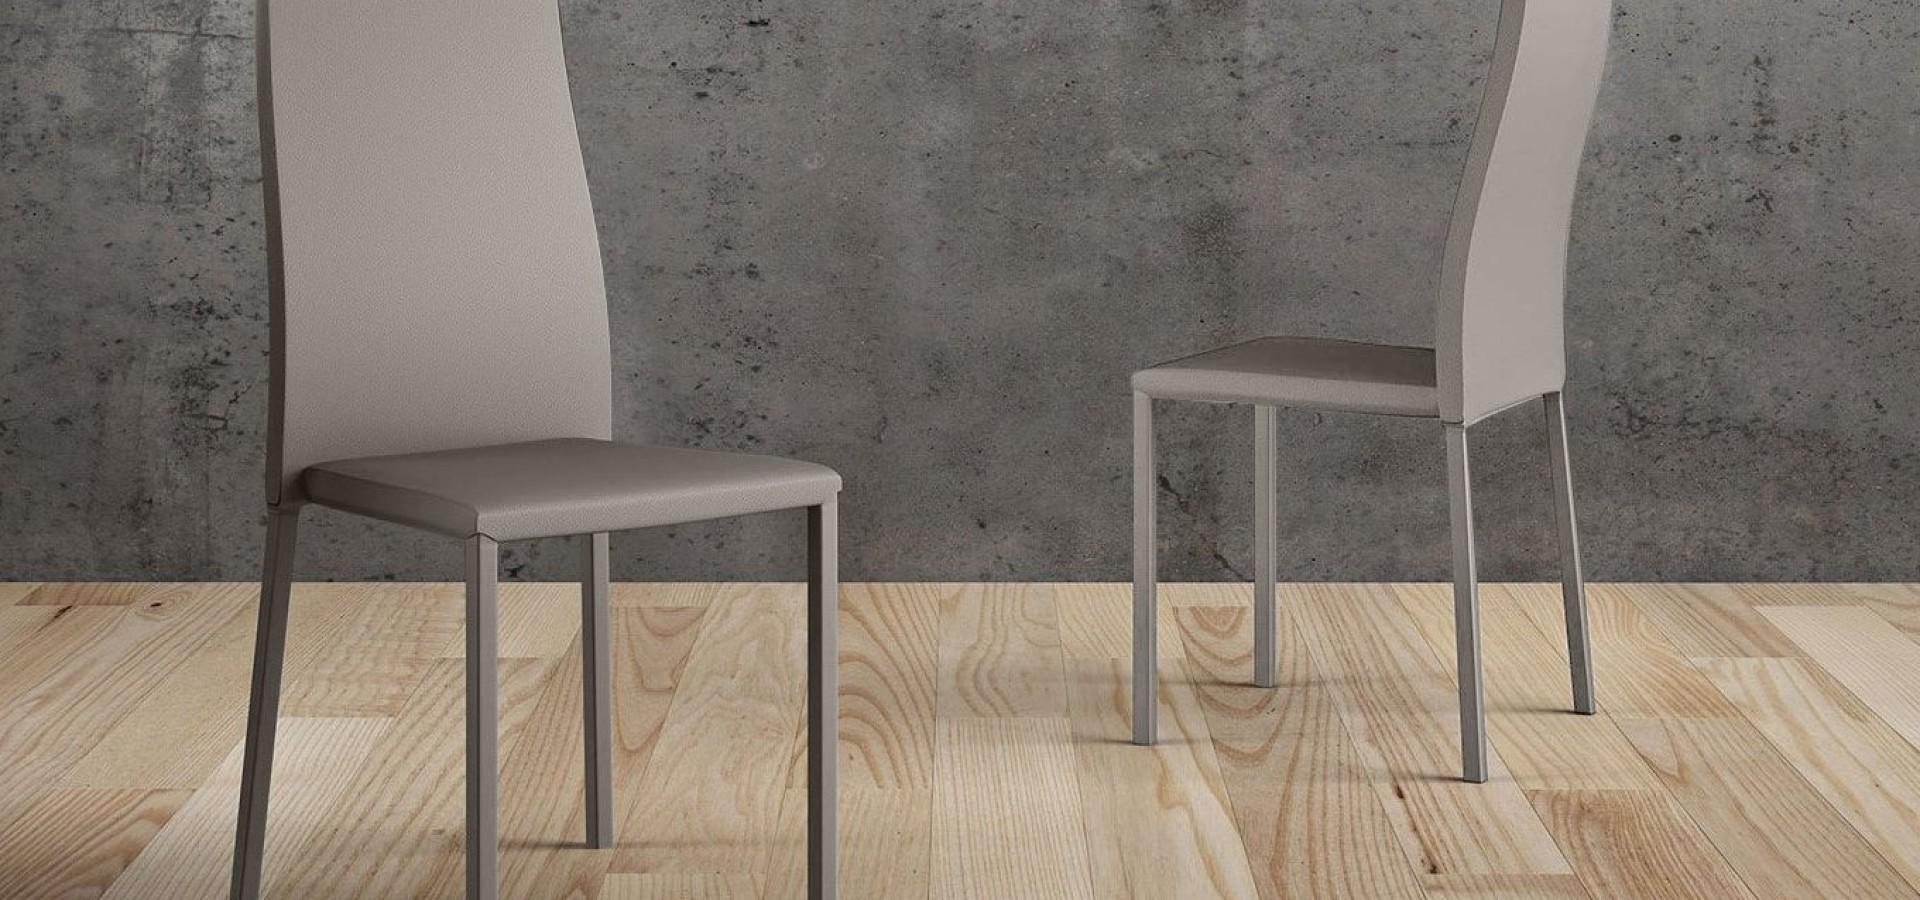 Итальянский стул Стул Melodie белый | ARREDO3